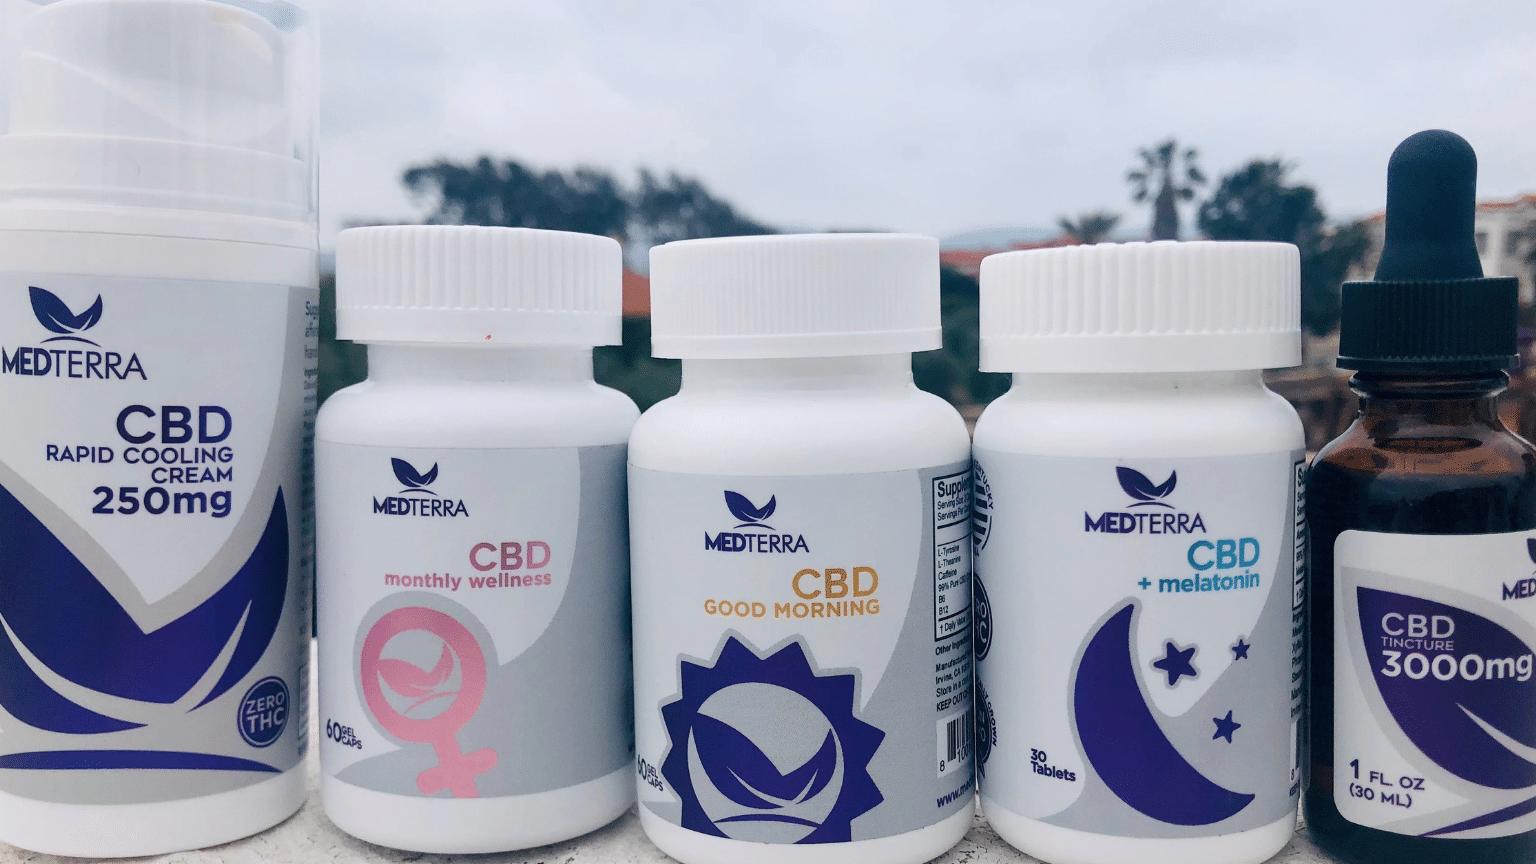 medterra-cbd-product-line